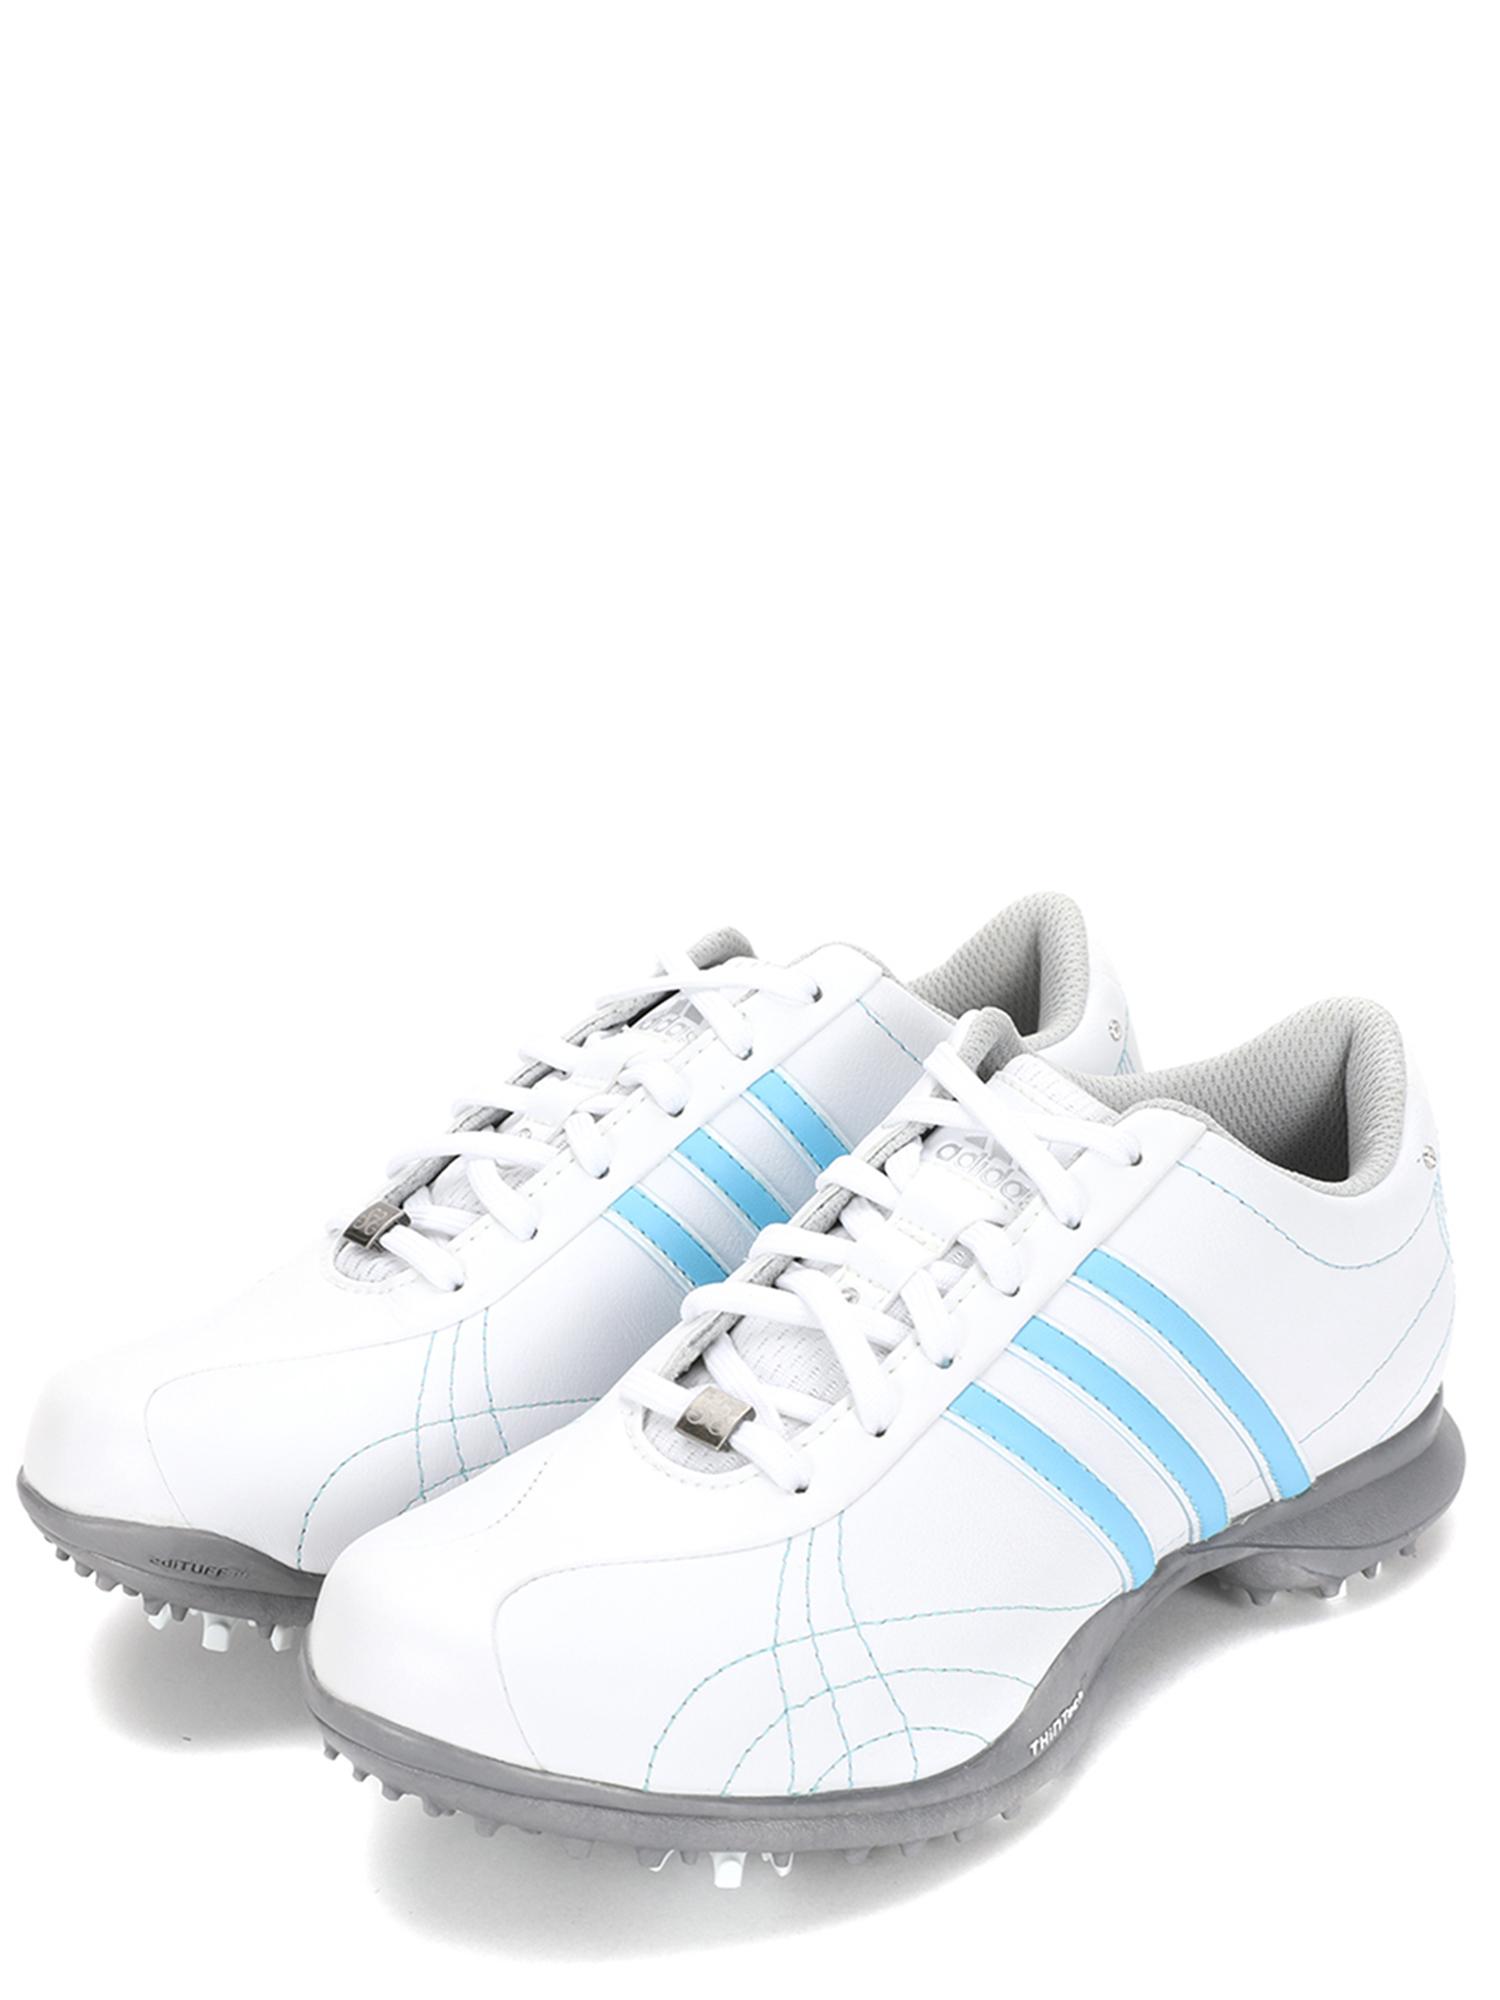 Adidas Women's Signature Natalie Golf Shoes 671468 White/Blue SZ 5